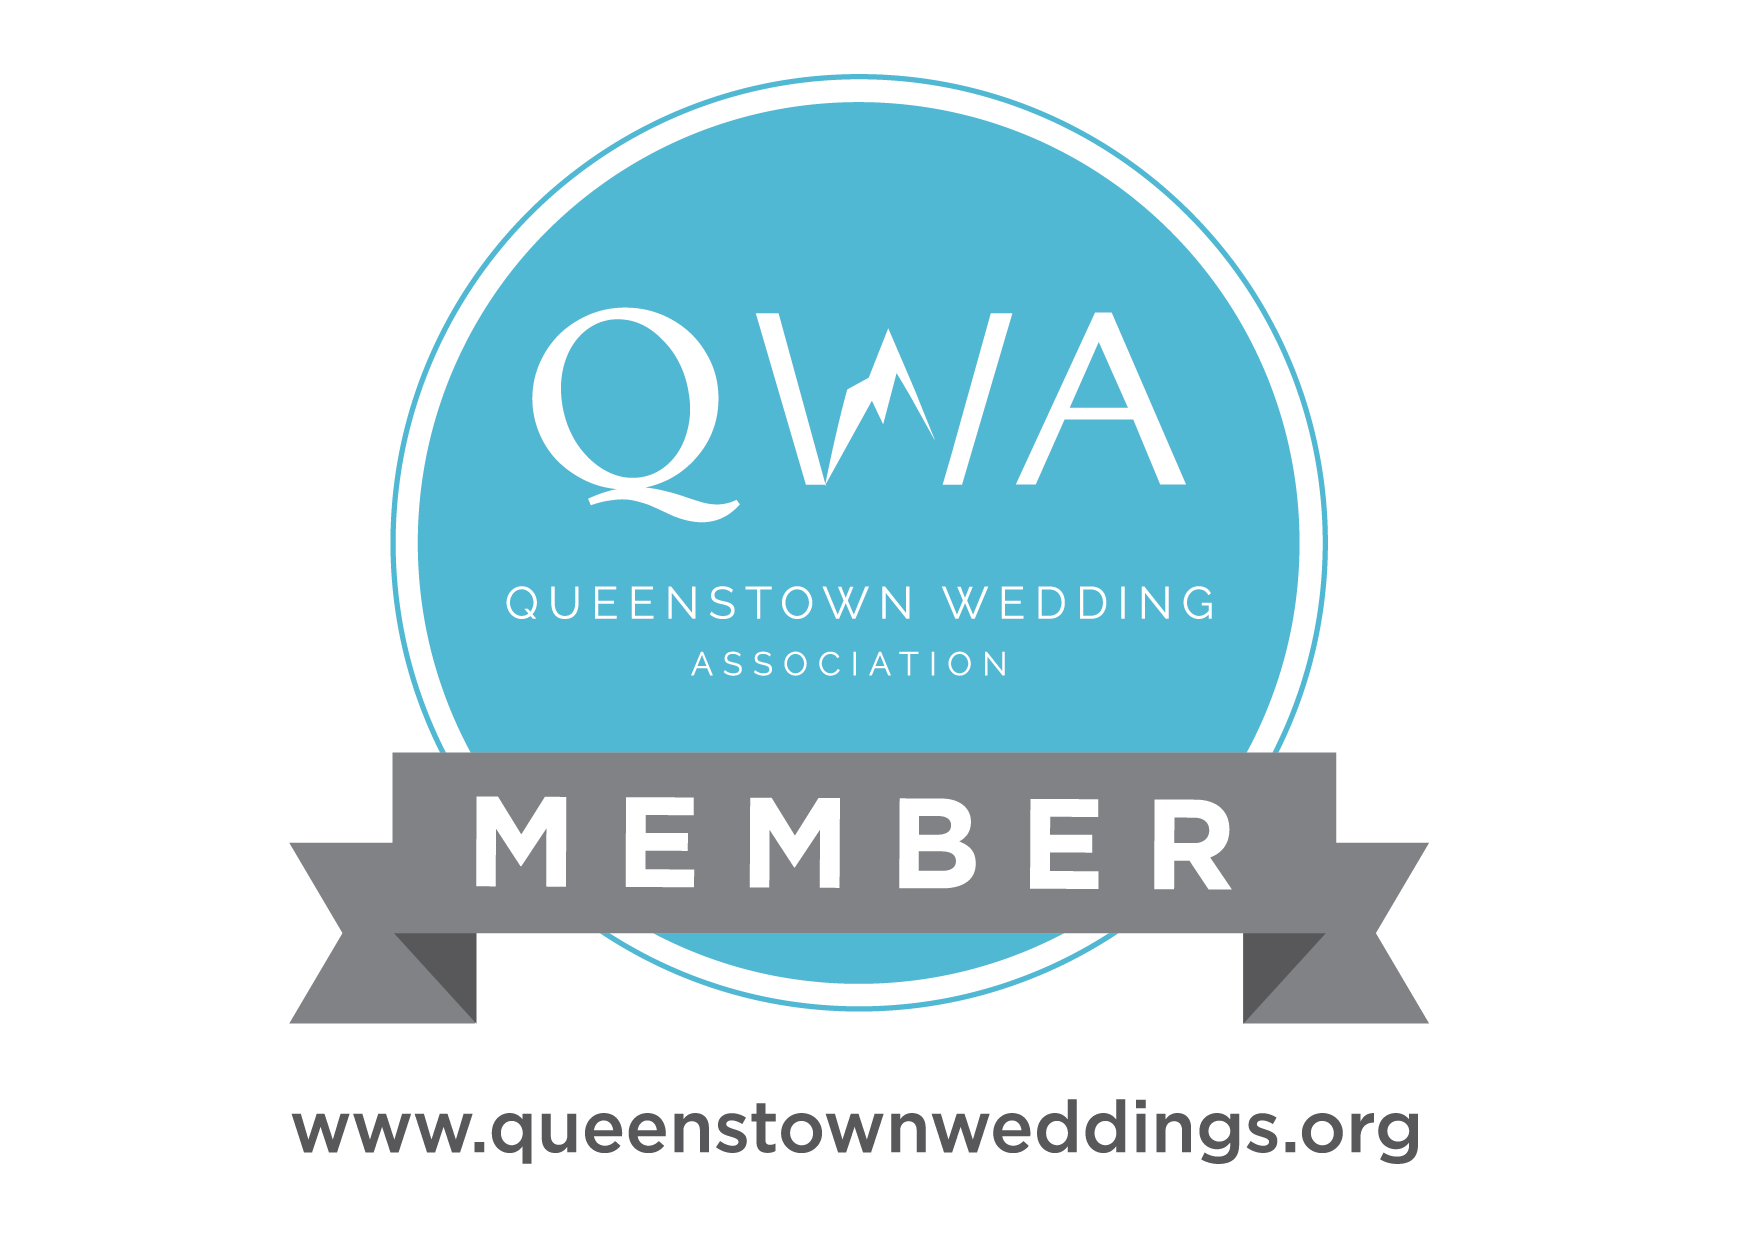 queenstown-wedding-association-member-spotlight-blog-featured-image